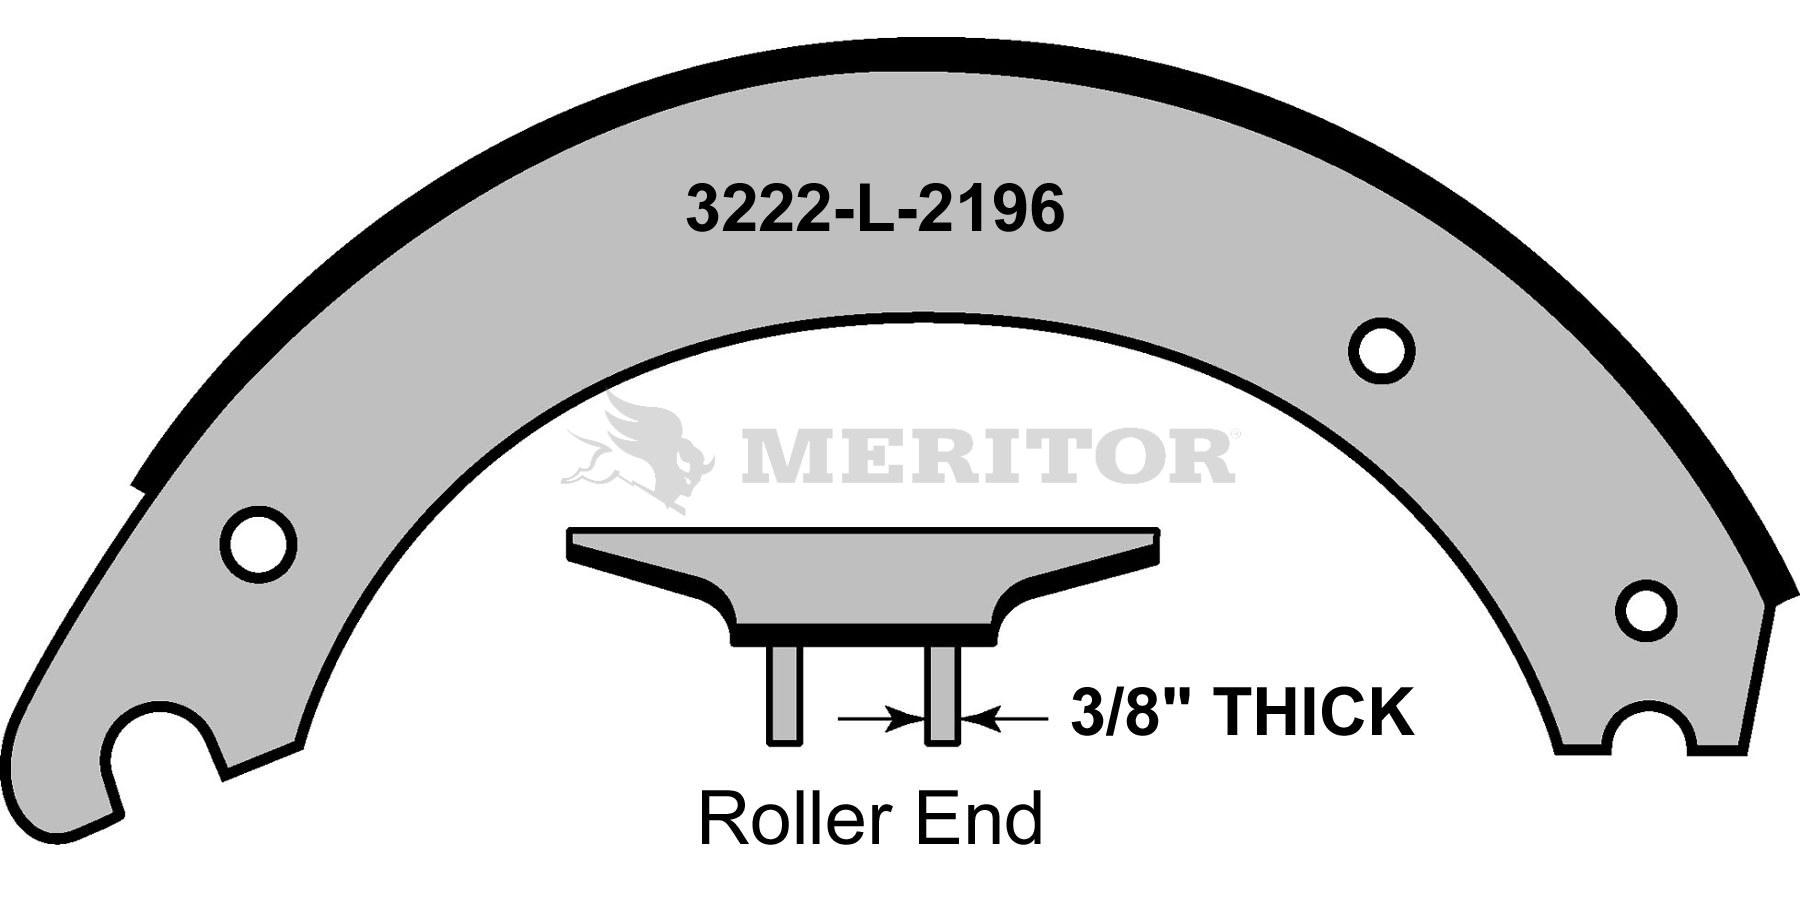 Meritor Steer Axle Parts Catalog : Sr qpr